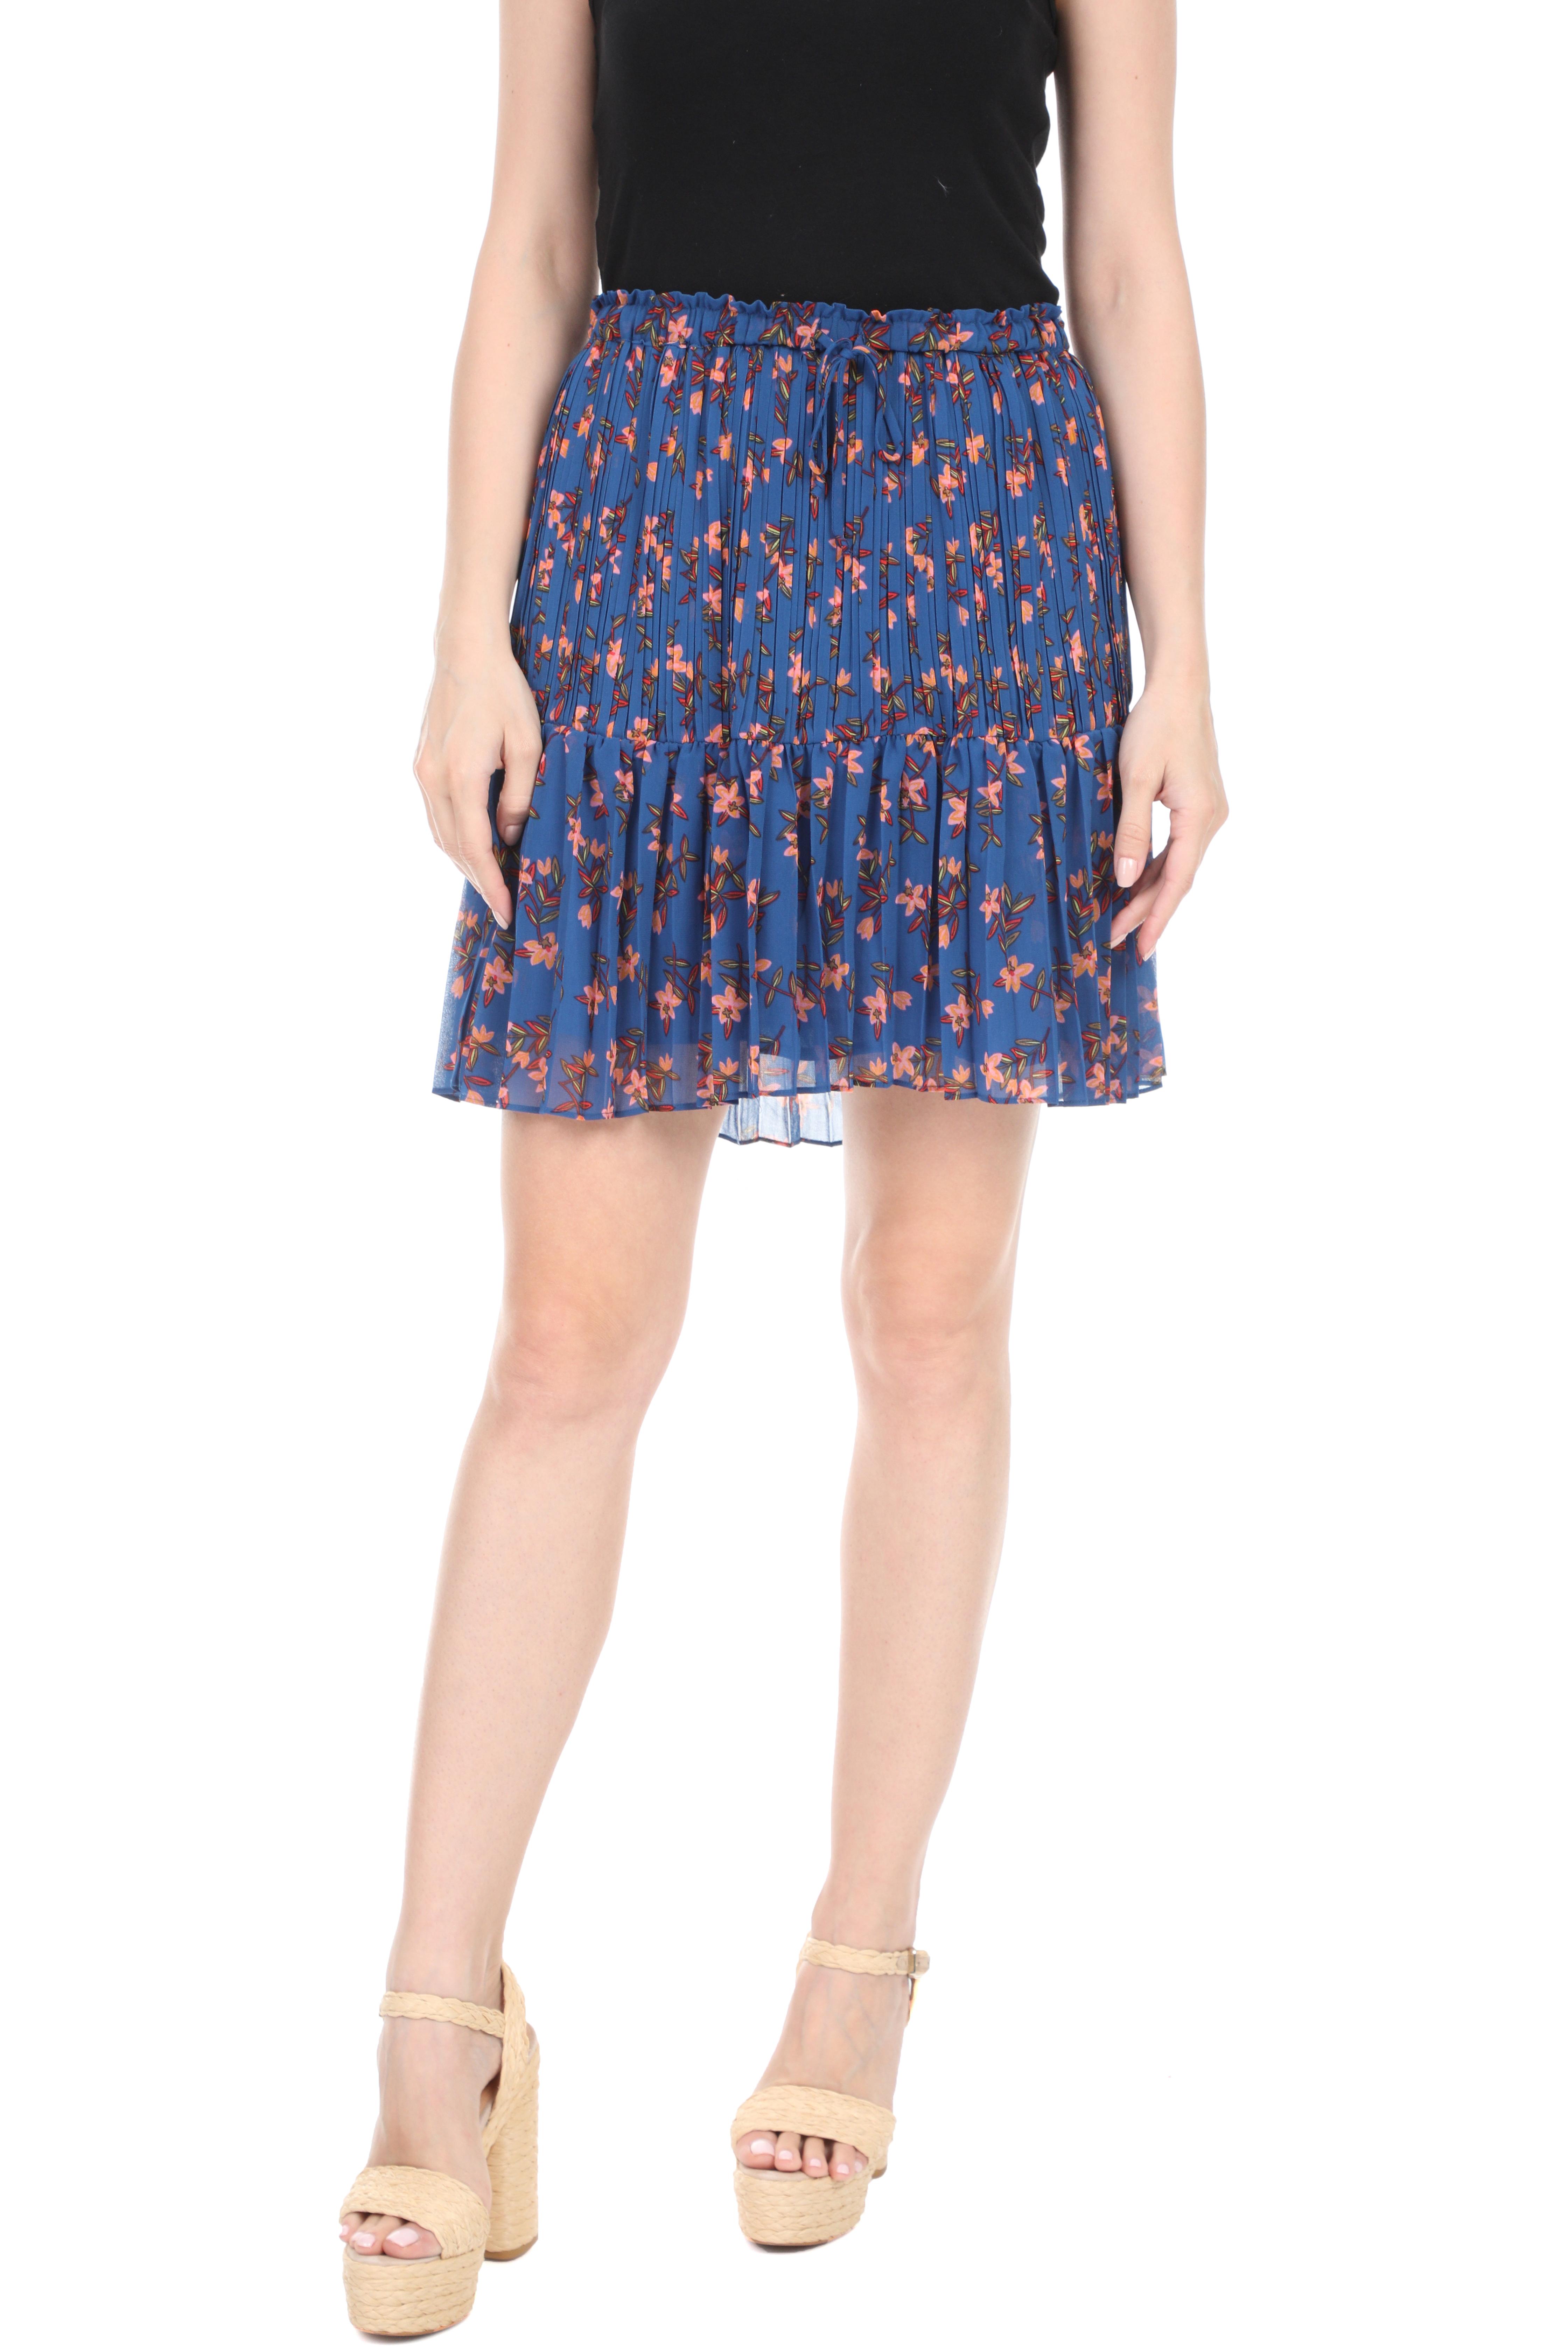 SCOTCH & SODA - Γυναικεία πλισέ mini φούστα SCOTCH & SODA μπλε